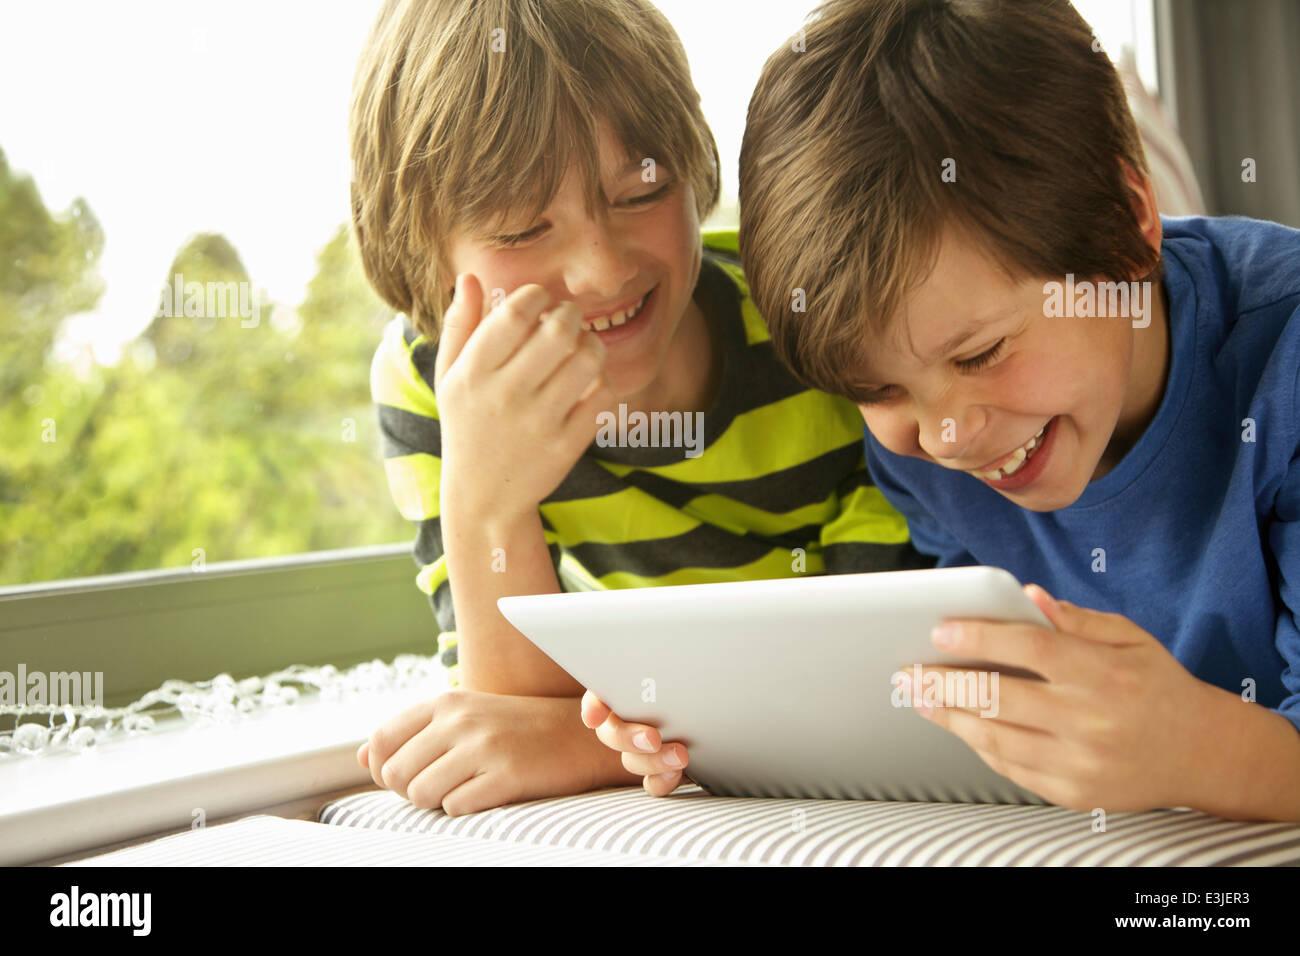 Boys Using Digital Tablet Smiling Stock Photo